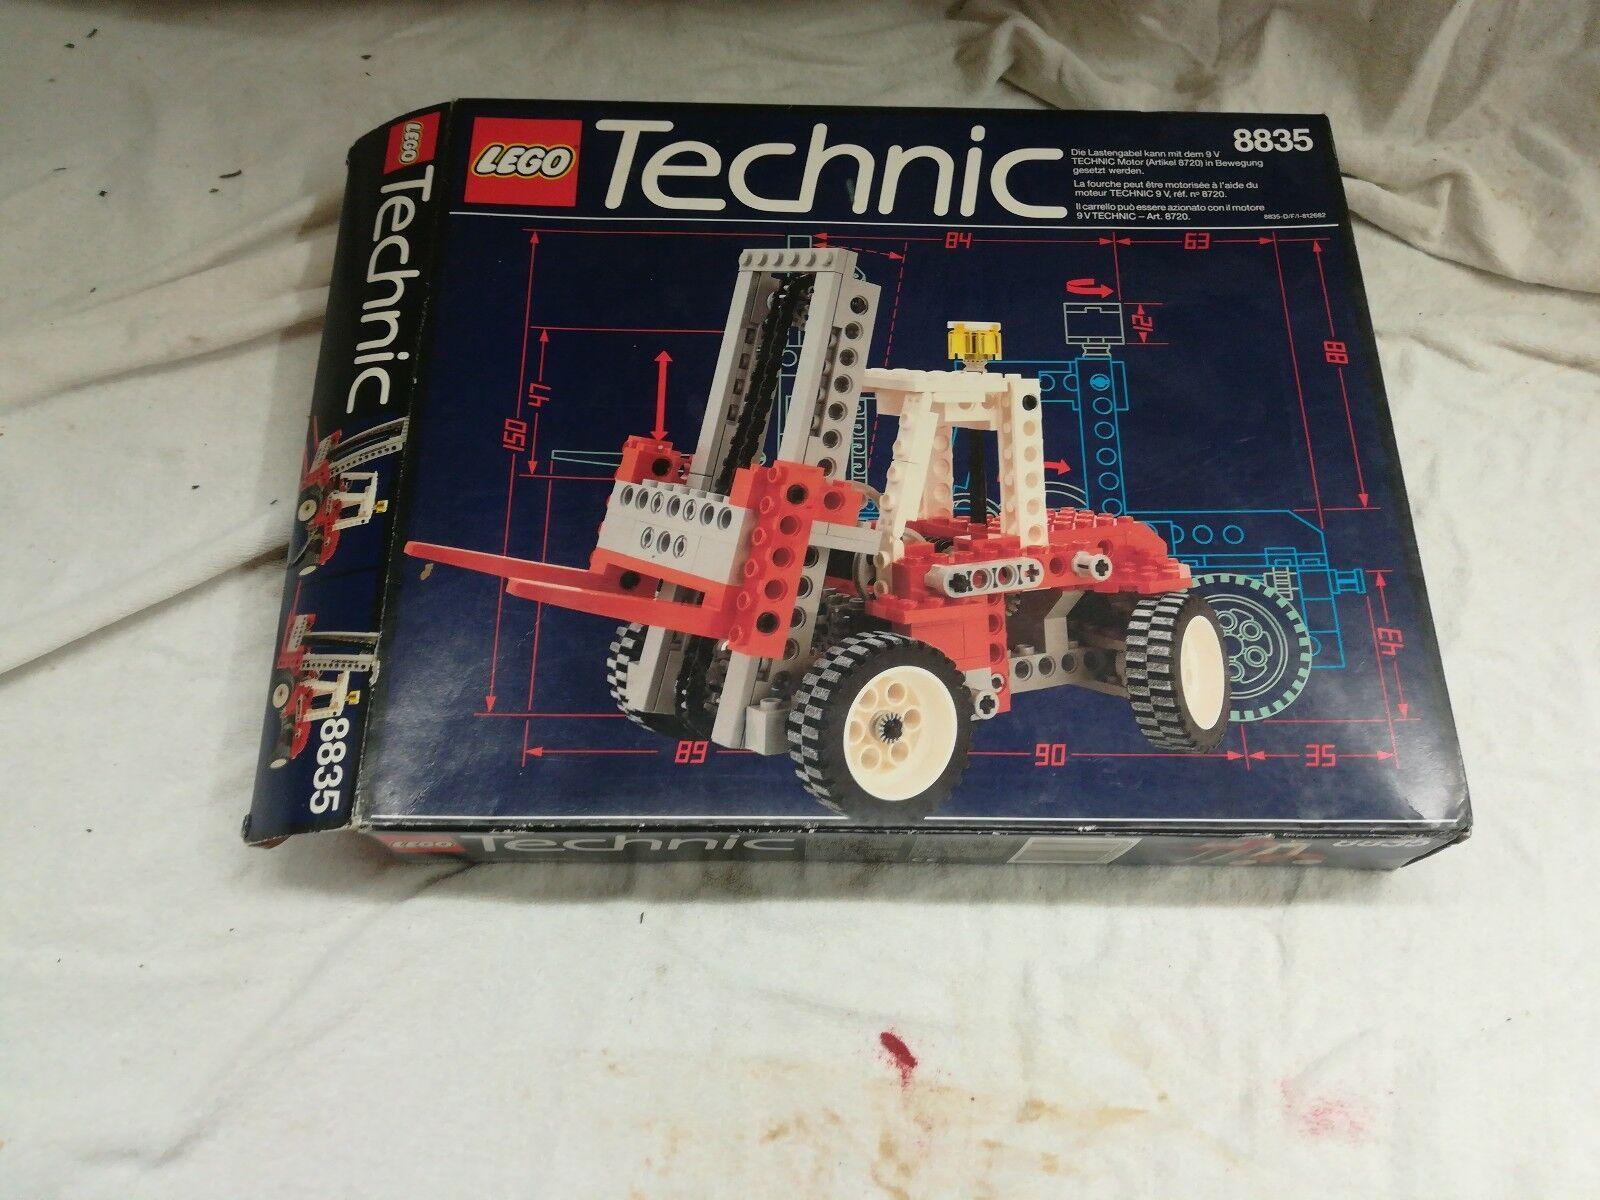 LEGO Technic 8835 Gabelstapler 1989 mit Original Bauanleitung